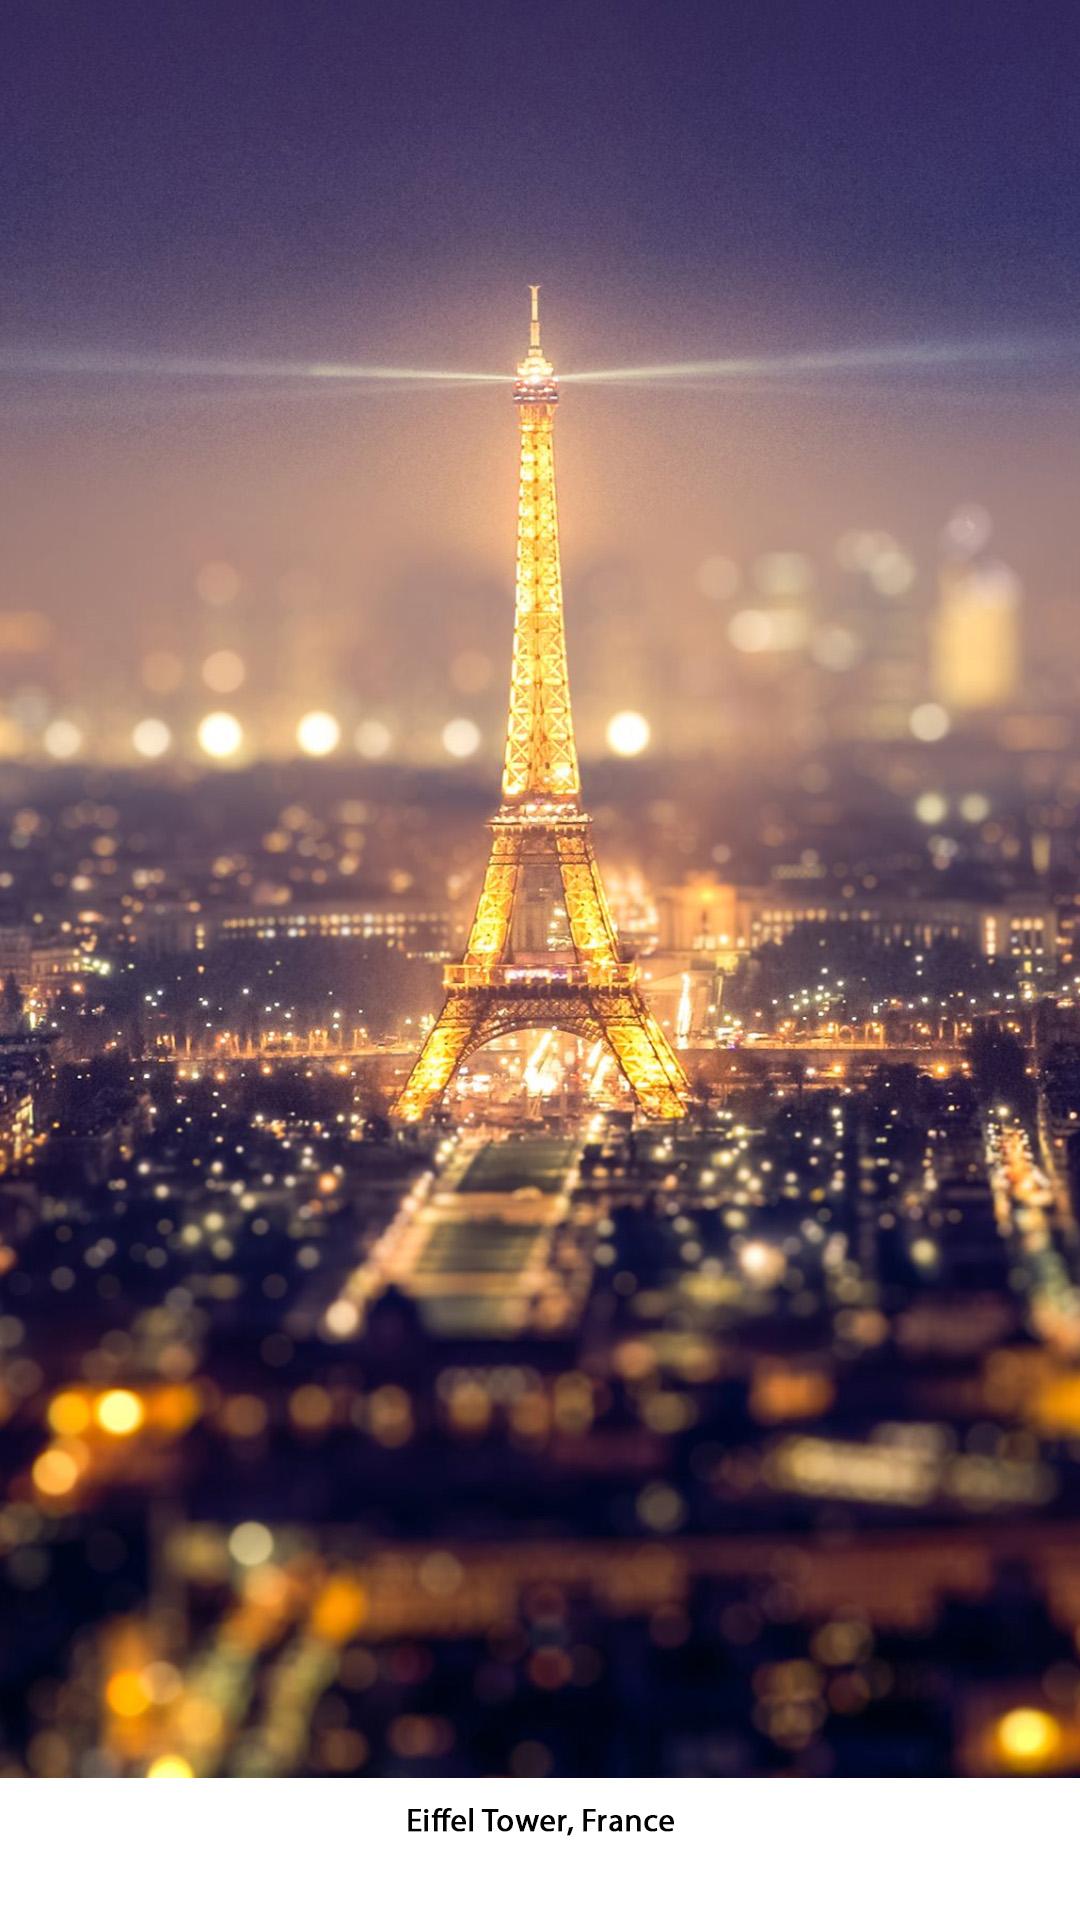 Frankrijk - Eiffel Tower-WIT